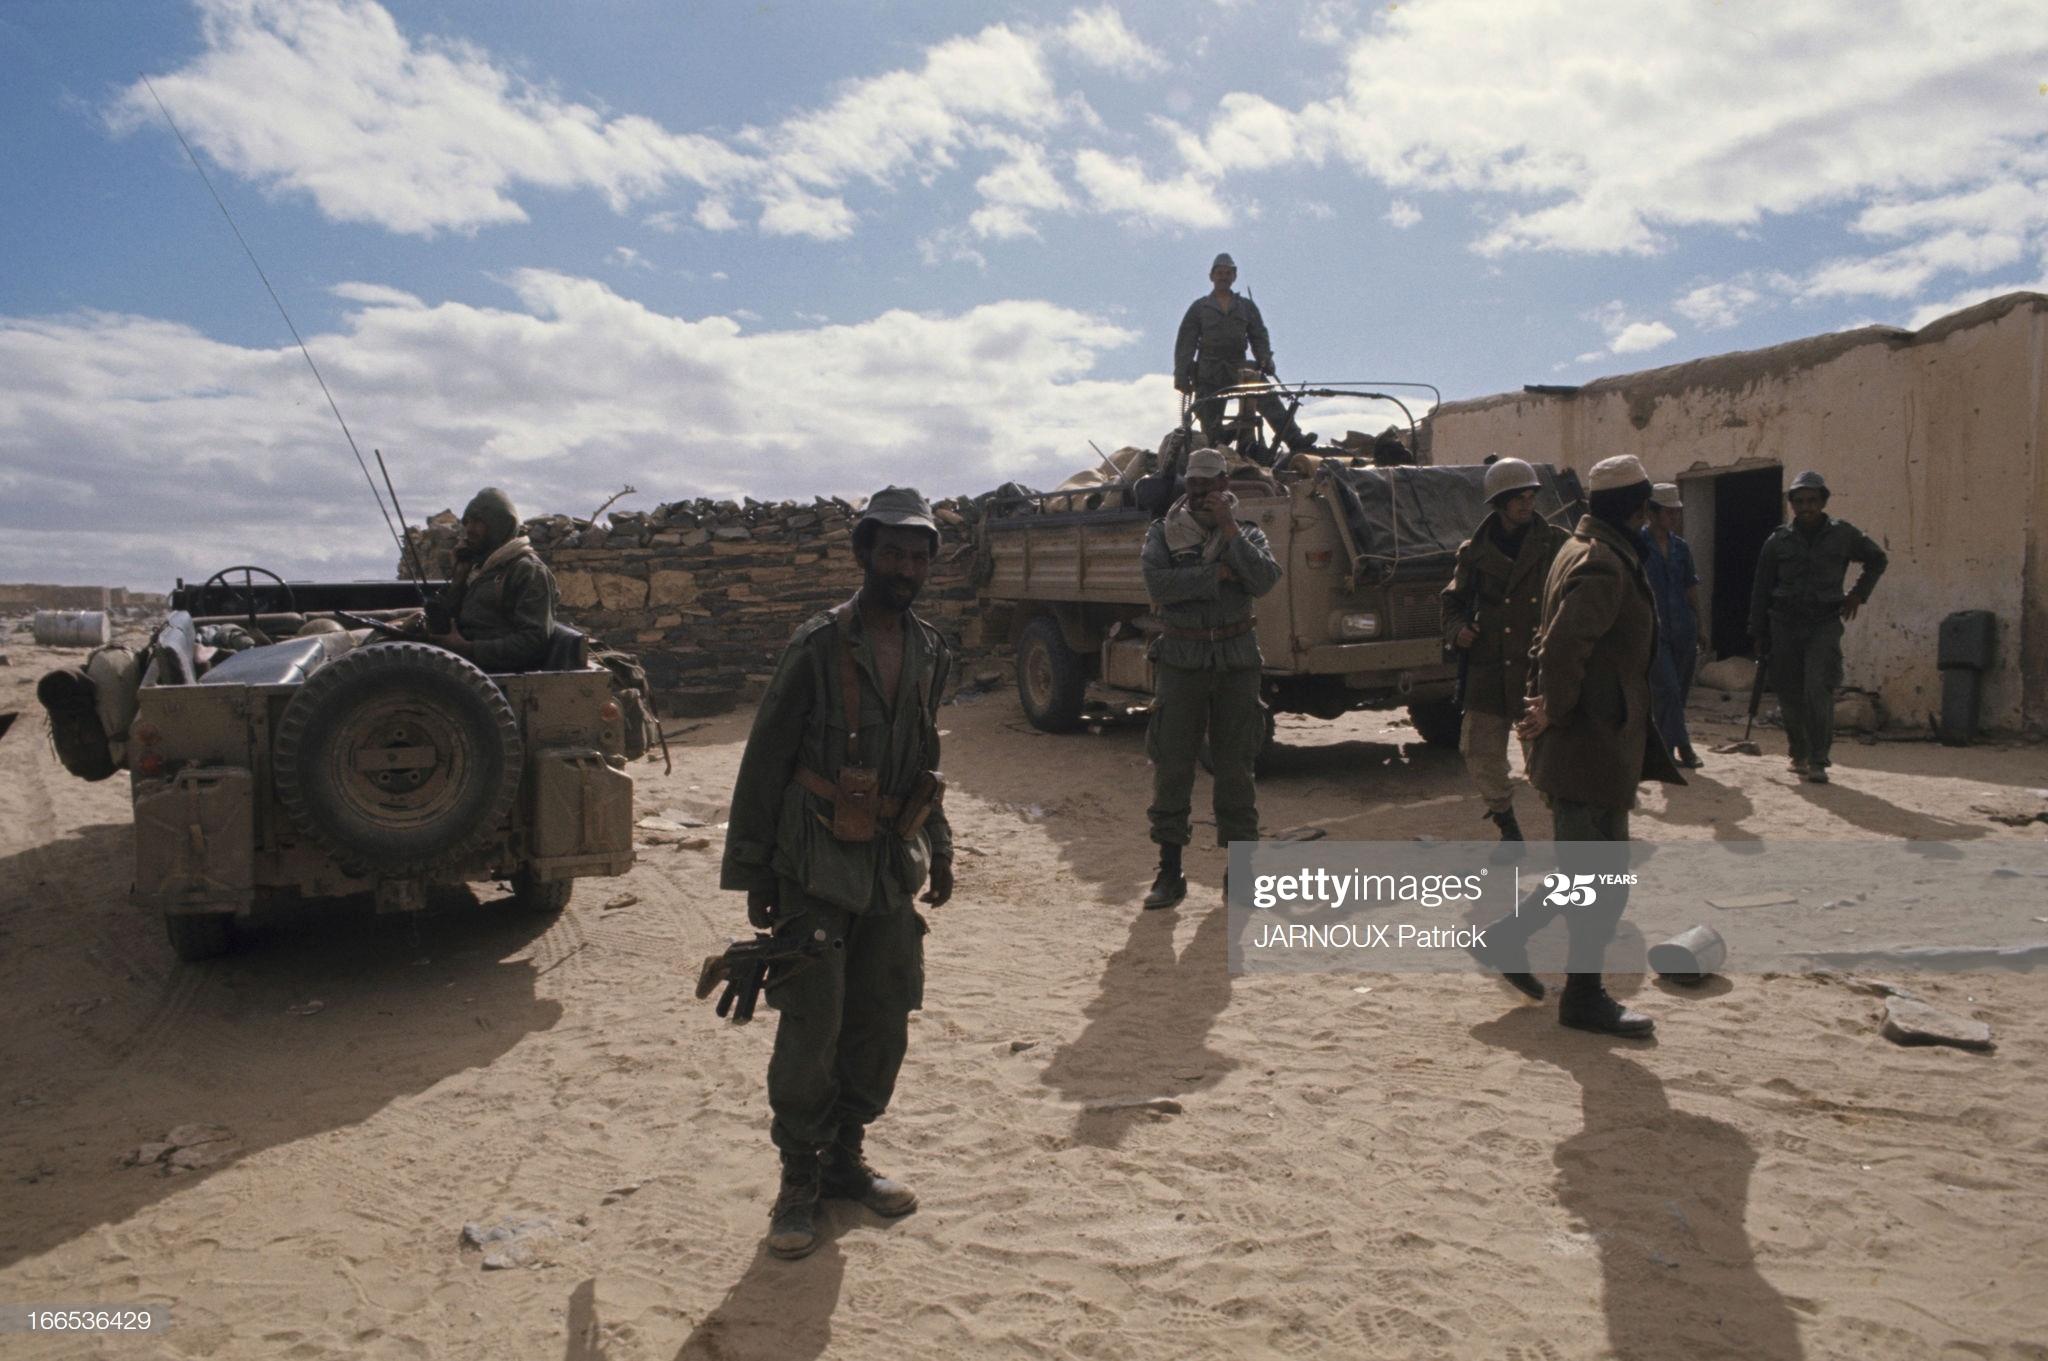 La Bataille d'Amgala - Page 2 Gettyi15